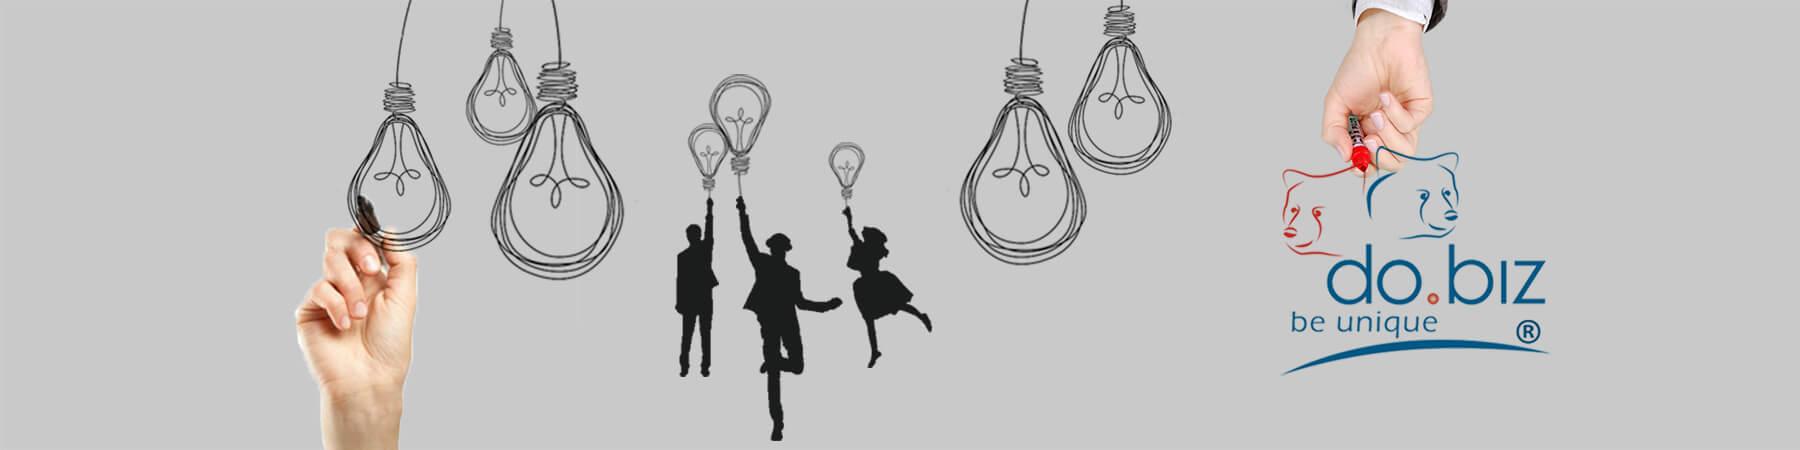 do.biz | אילן שבת | ייעוץ עסקי | ליווי עסקי | פתרונות לעסקים Logo